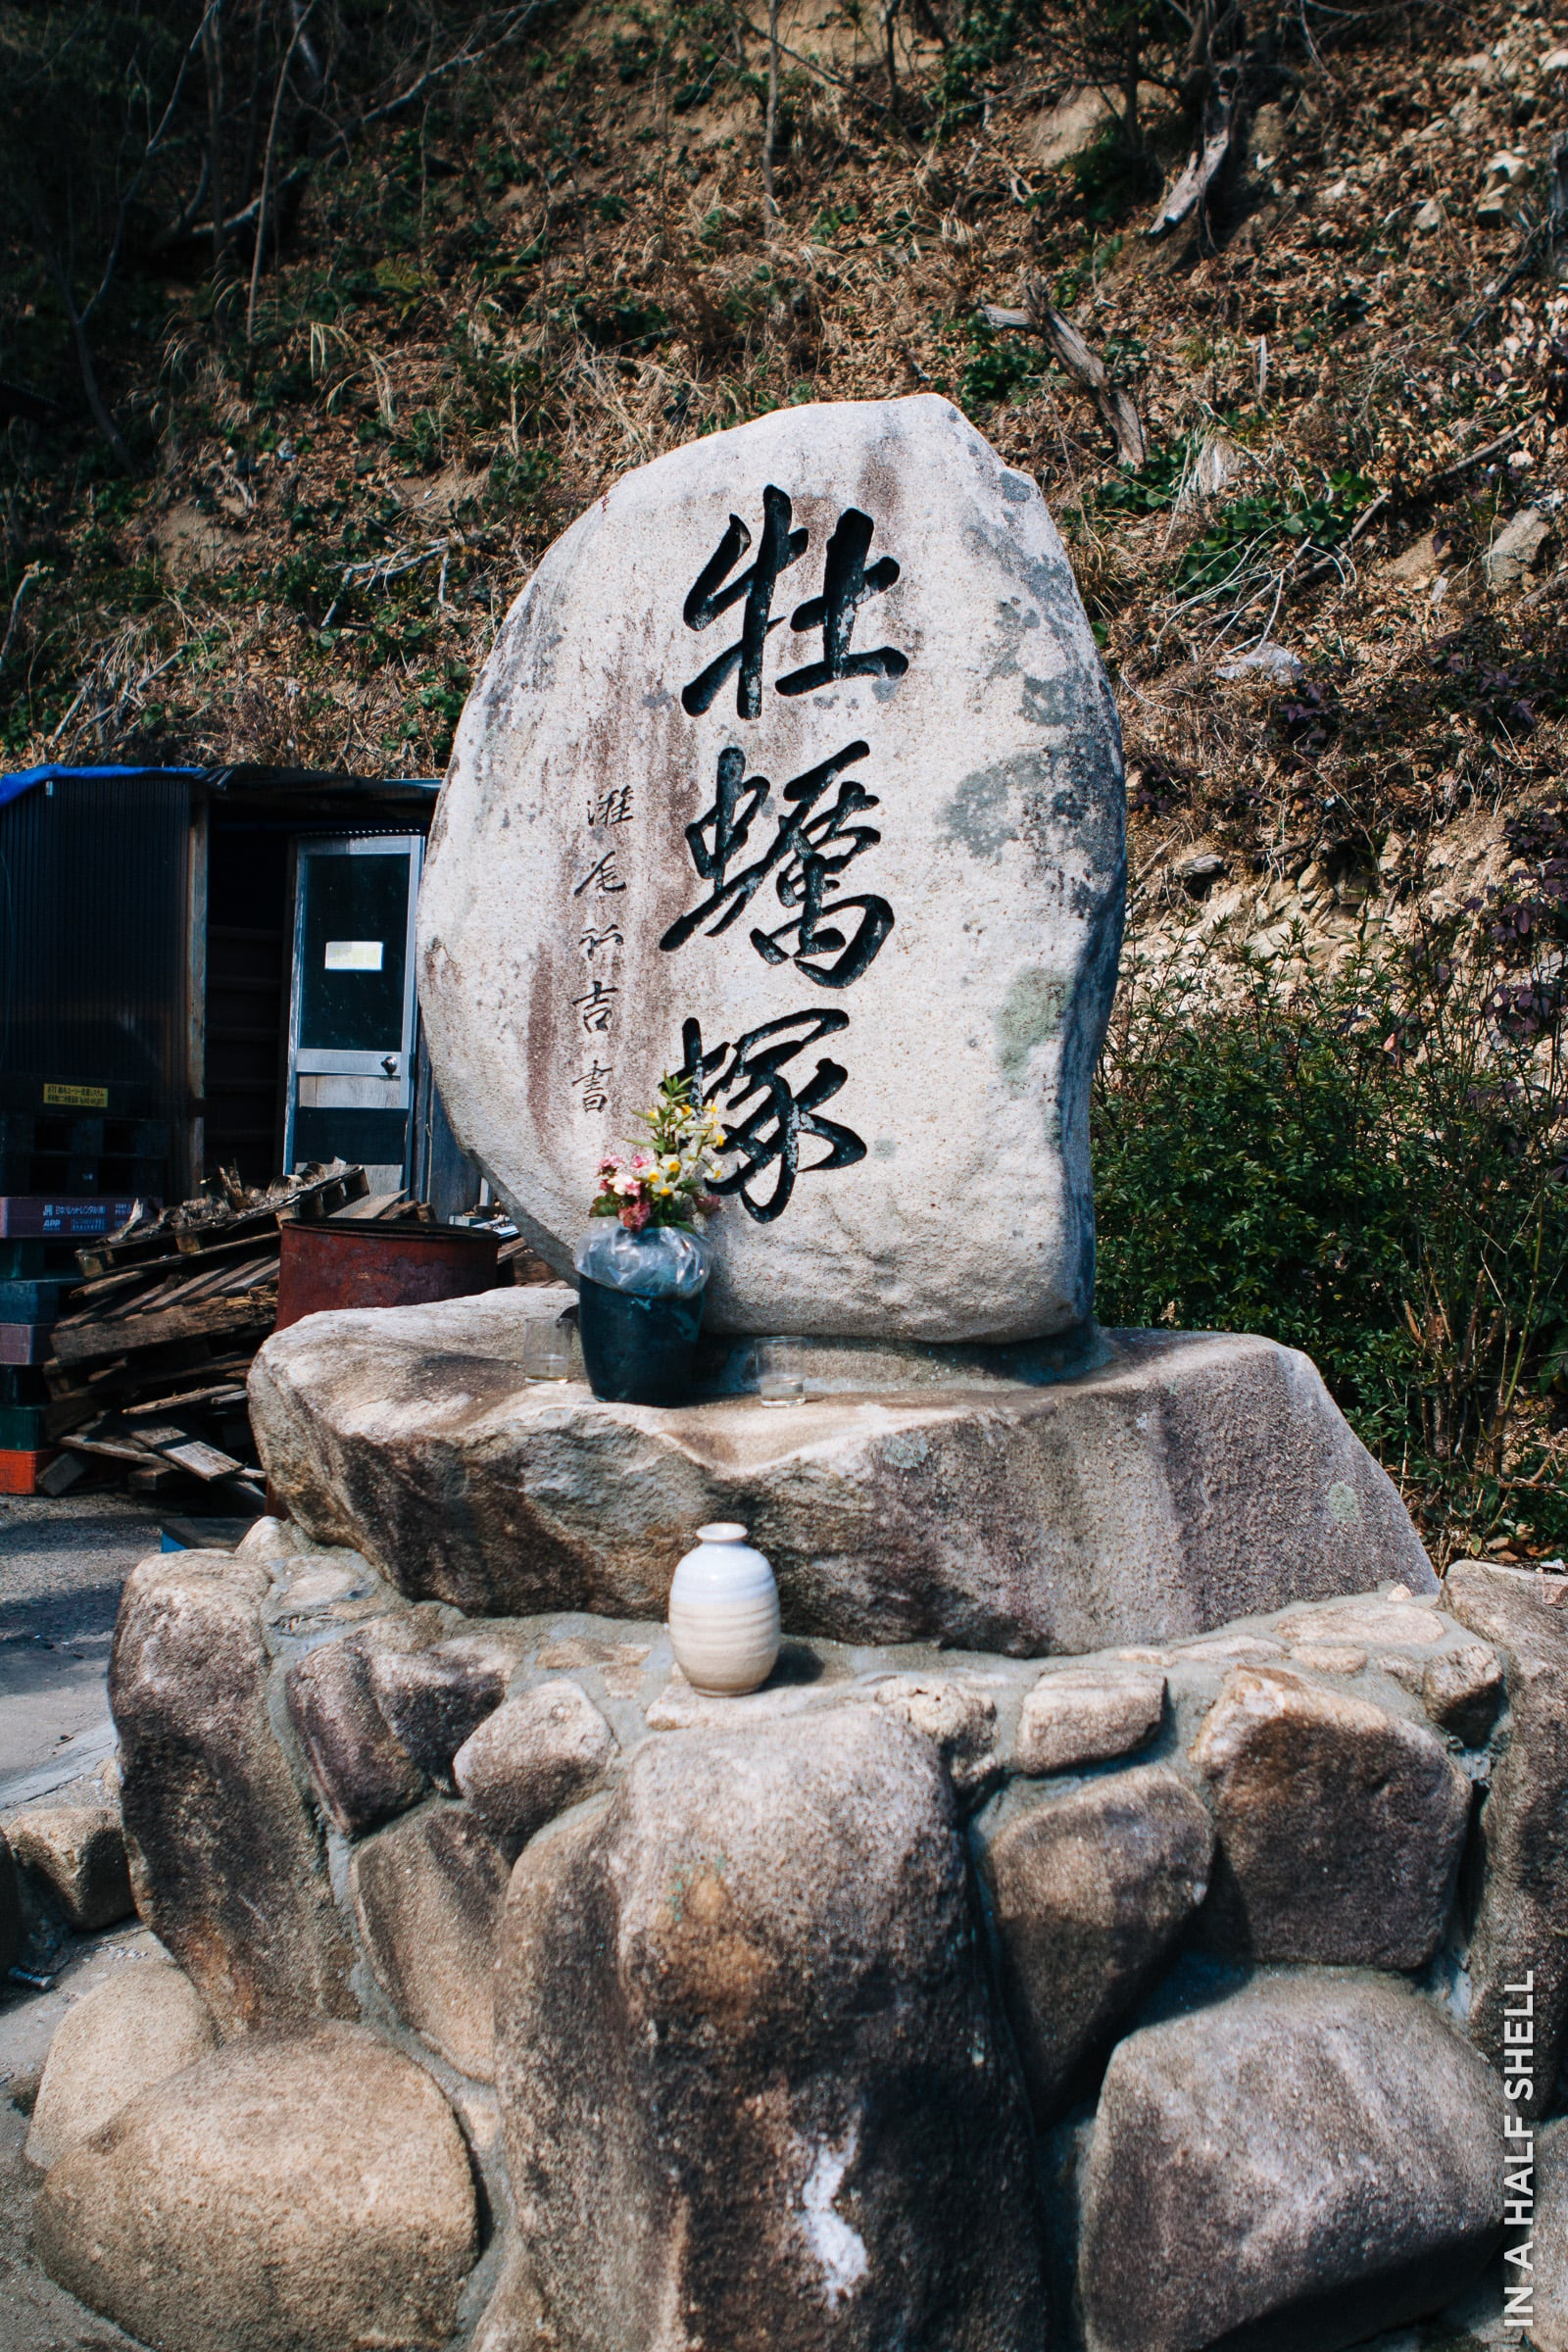 InAHalfShell-2014-HiroshimaOysterFarm-21.jpg